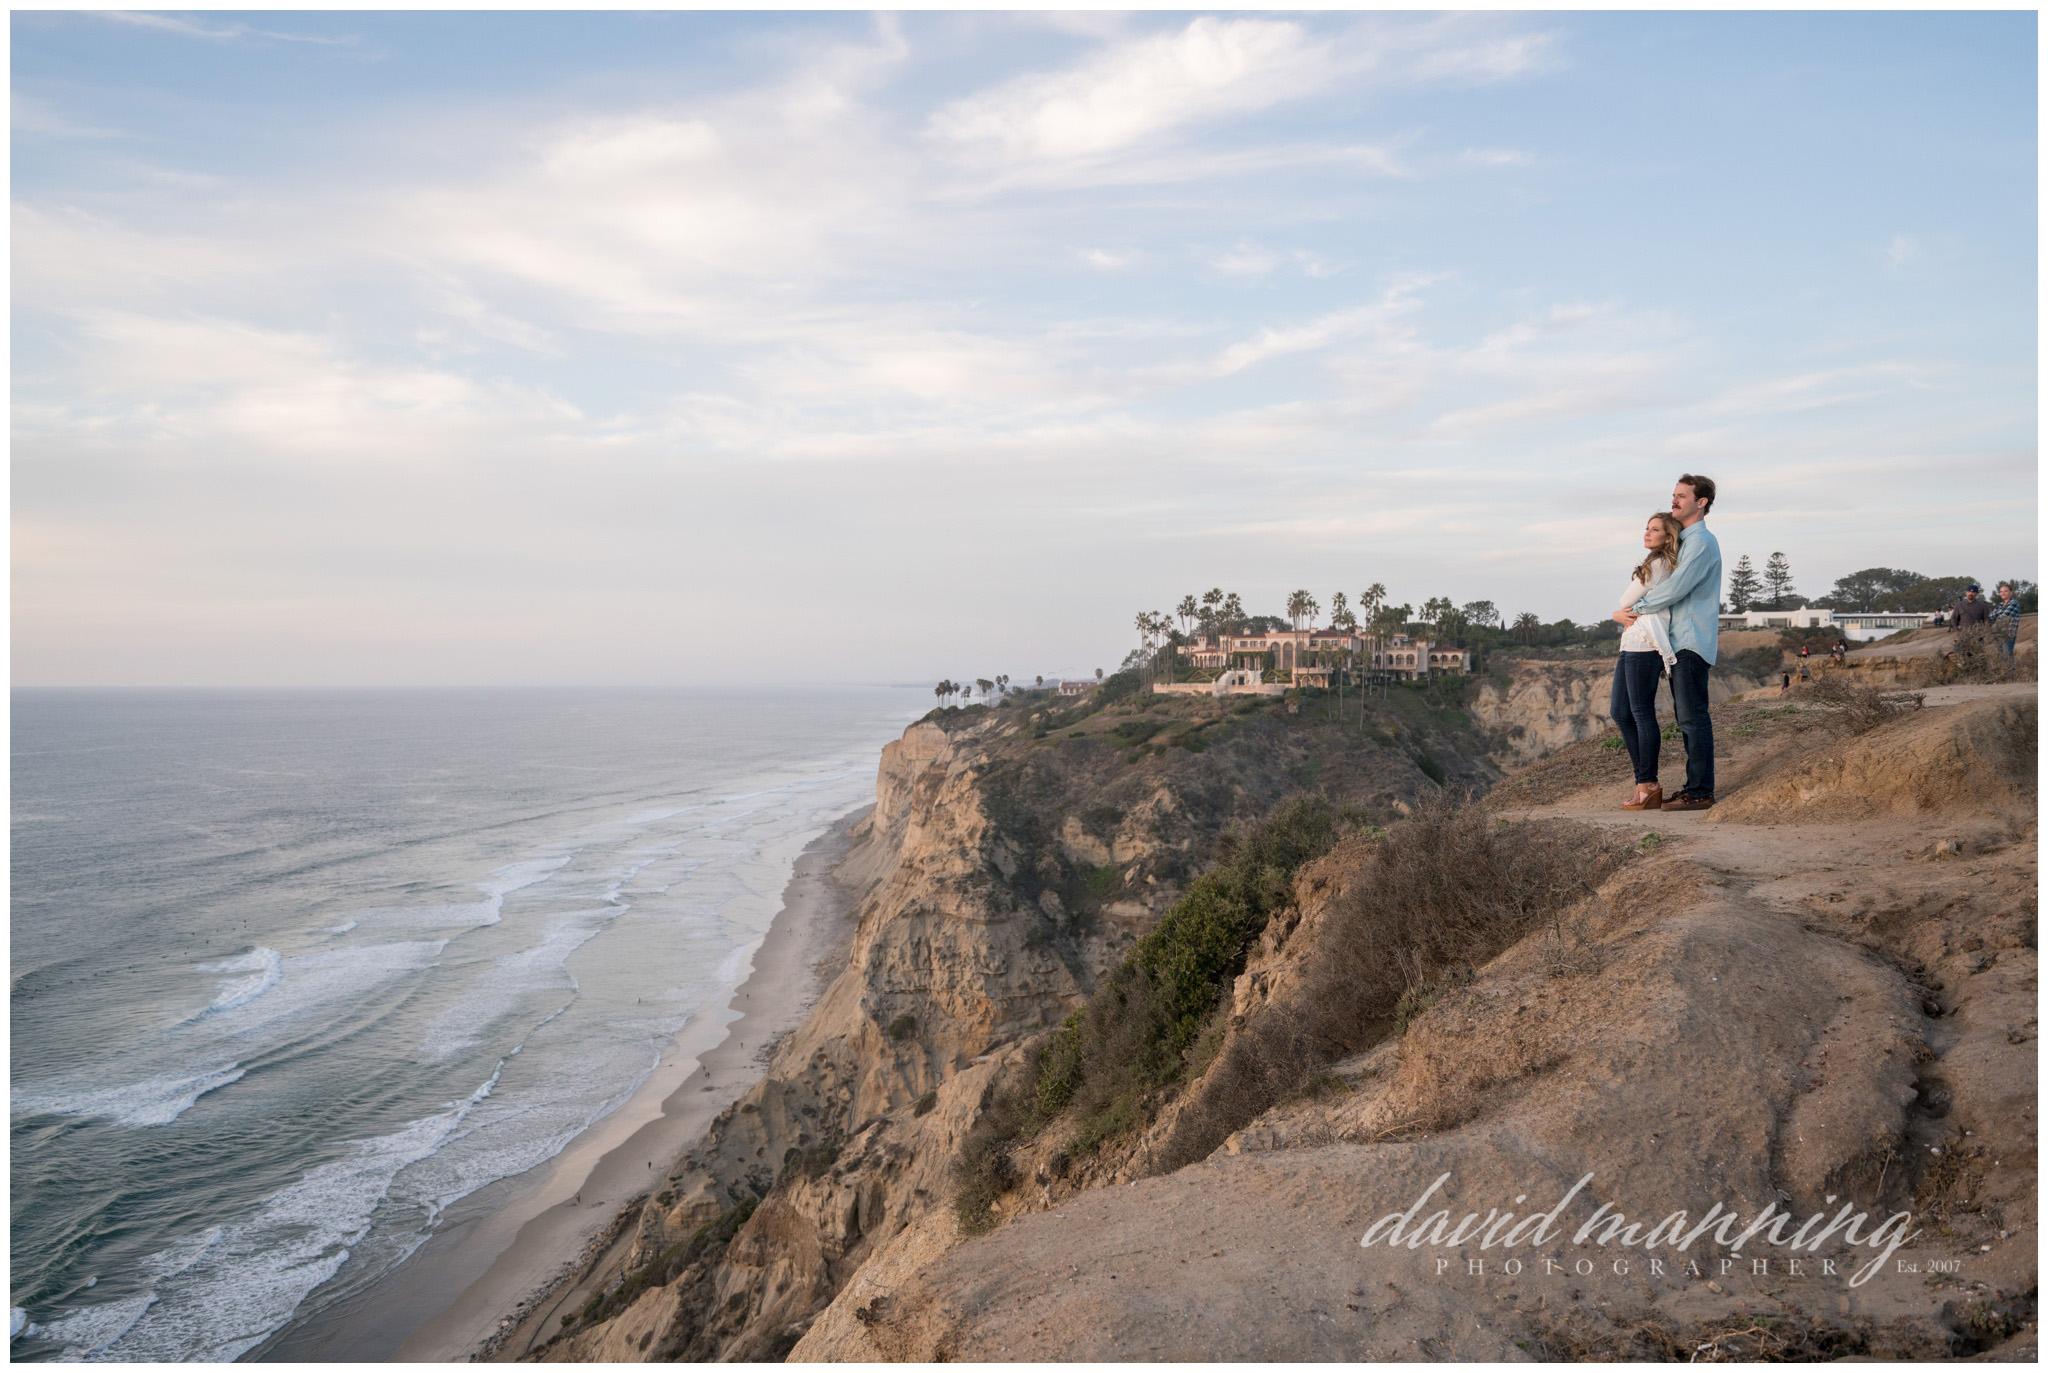 Alyssa-Taylor-Engagement-David-Manning-Photographer-0137.JPG